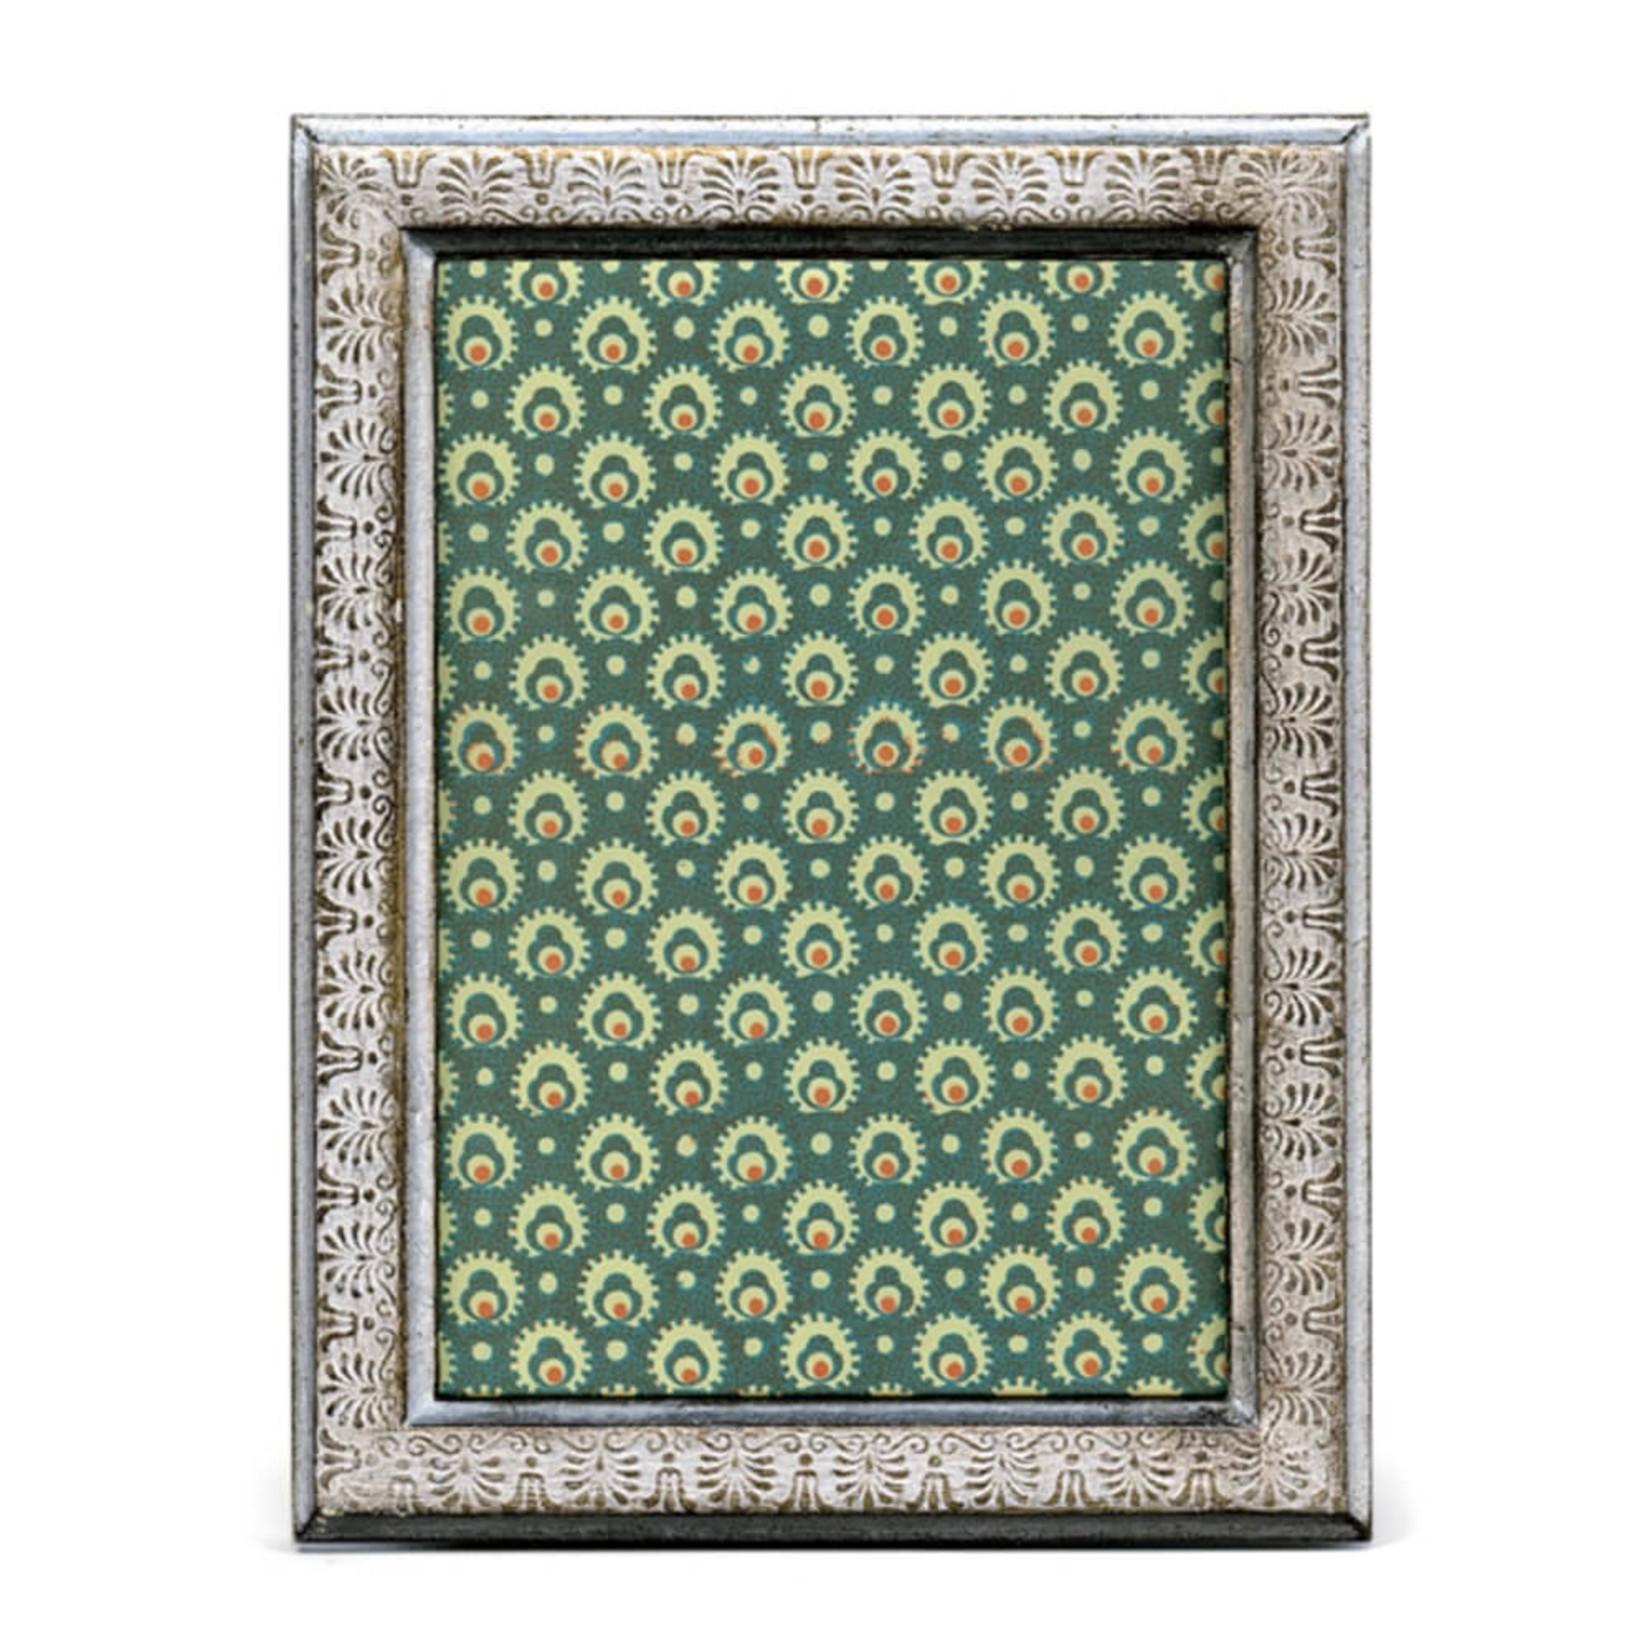 Cavallini & Co. Pavoni Silver Frame